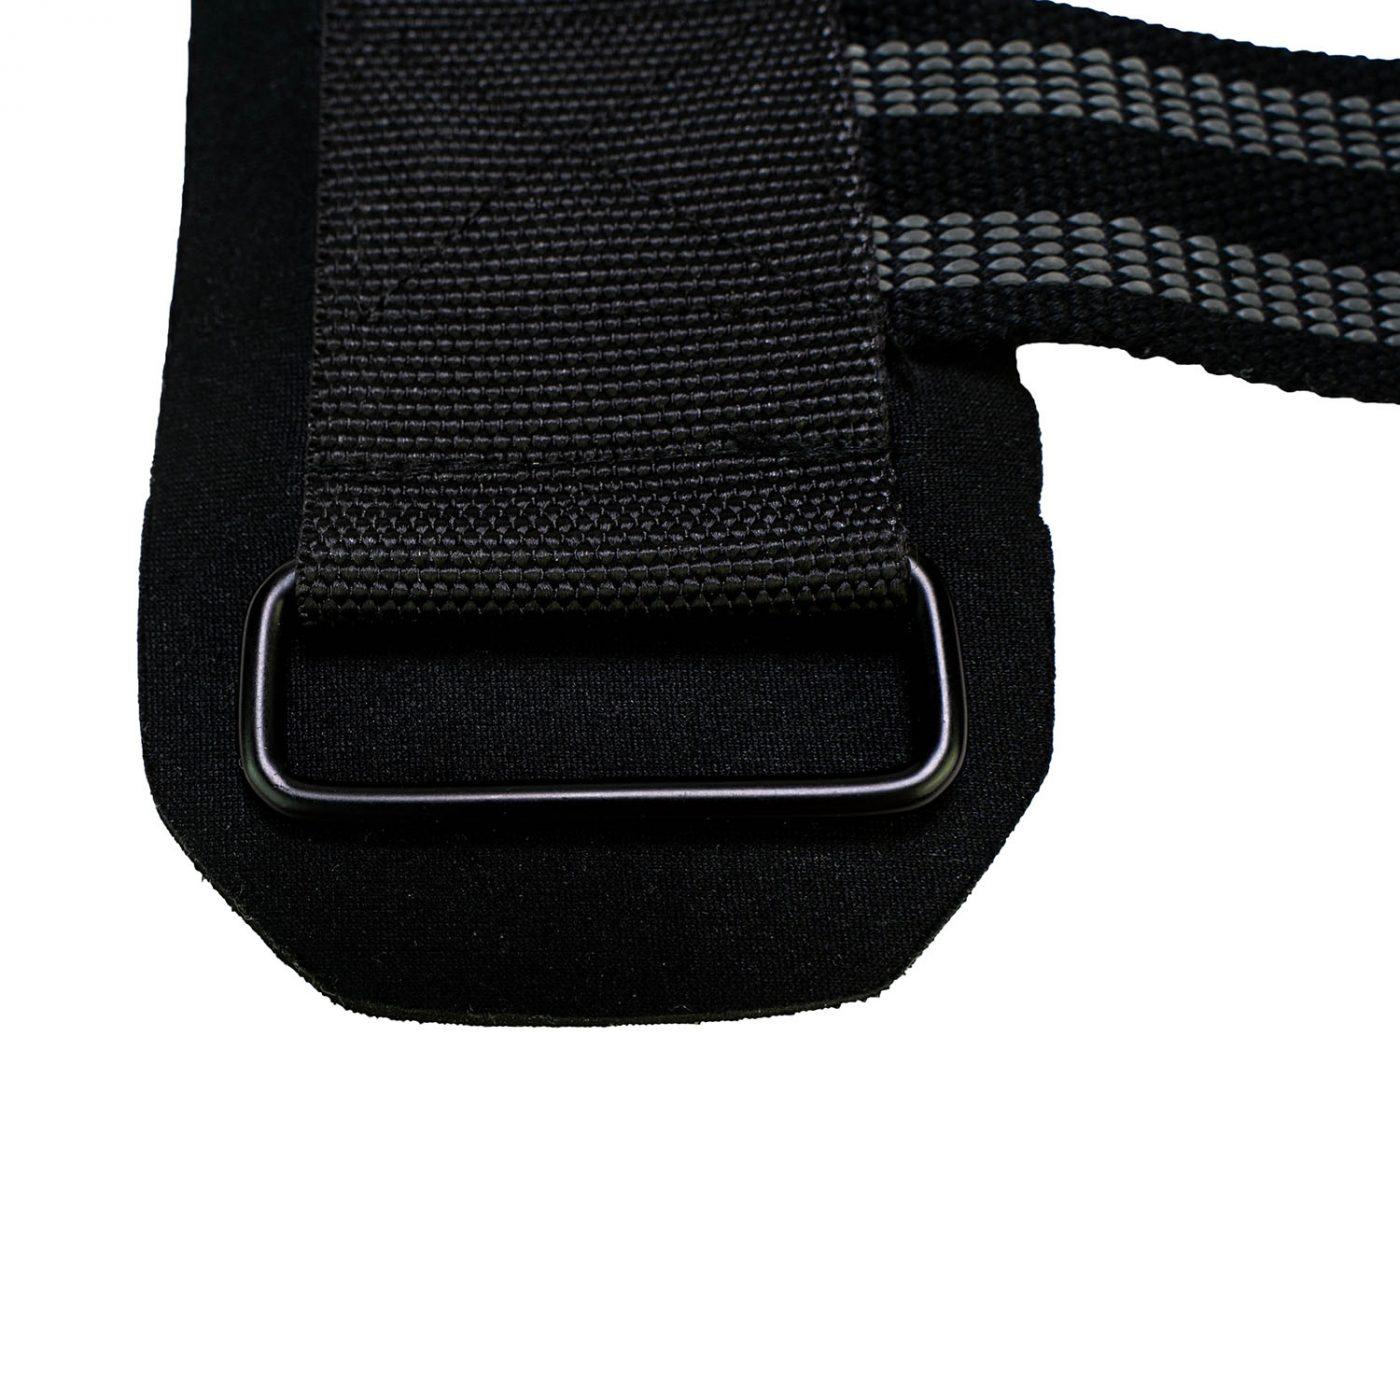 Tunturi Lifting Straps - wrist straps - Padded - Pro